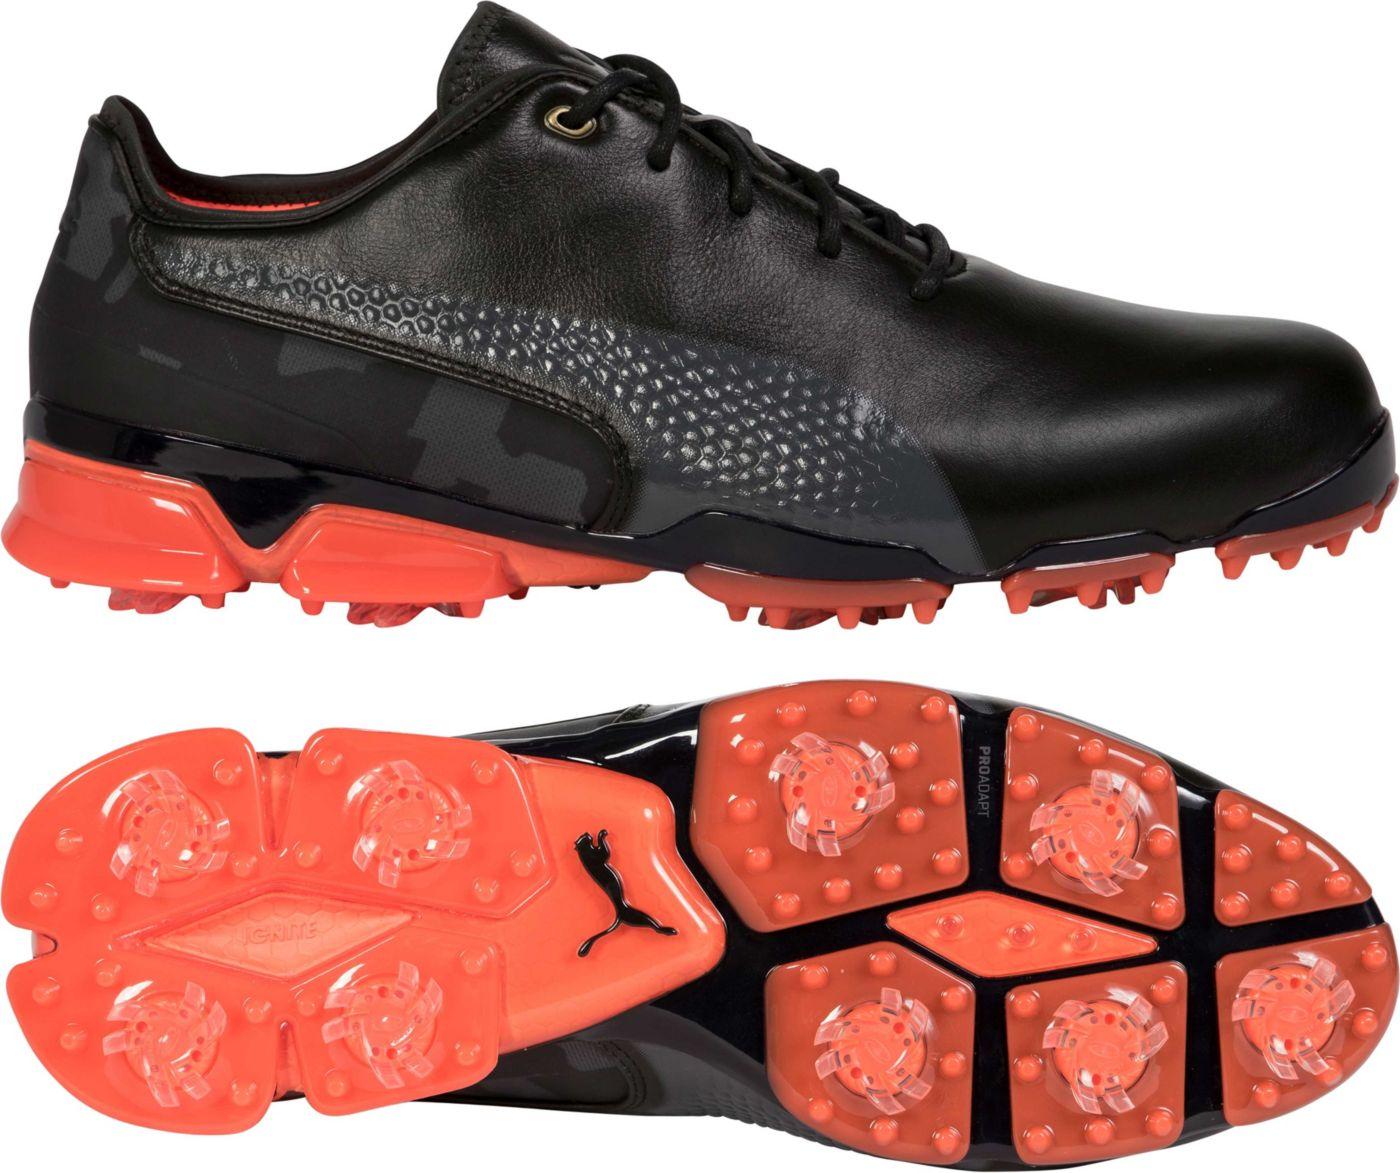 PUMA Men's Limited Edition Camo IGNITE PROADAPT Golf Shoes